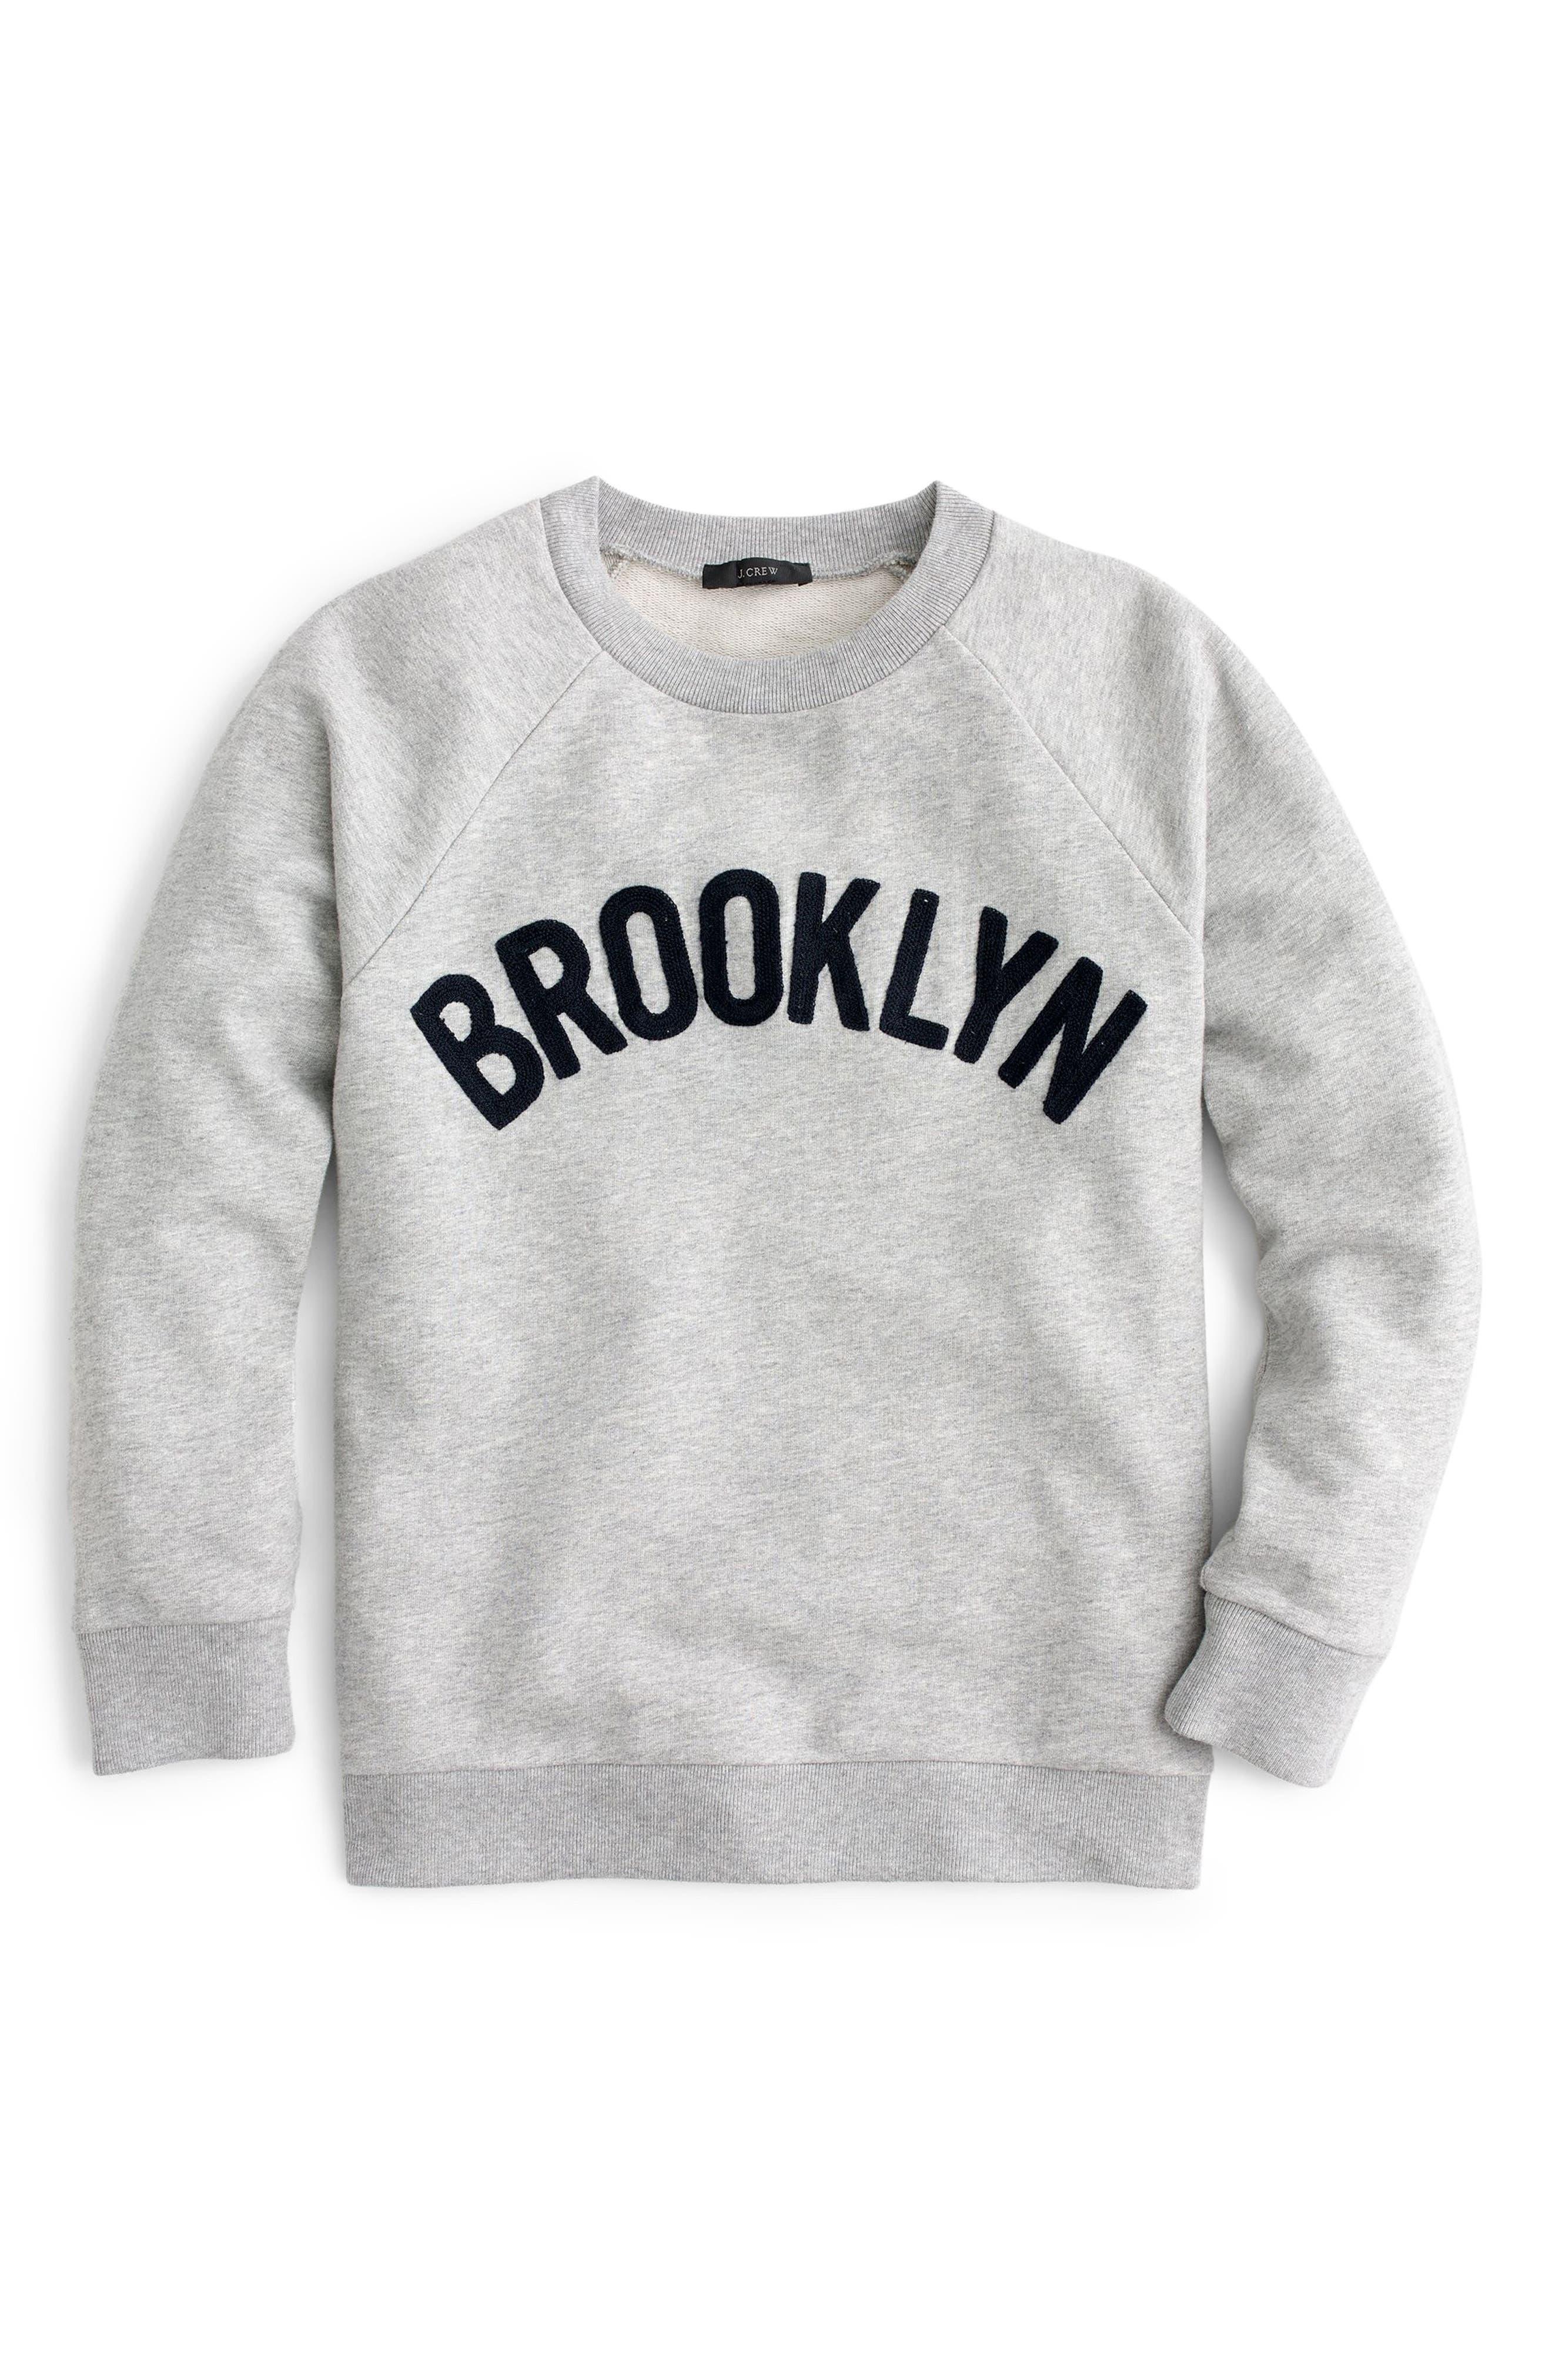 J.CREW, Brooklyn Sweatshirt, Alternate thumbnail 2, color, HEATHER GREY